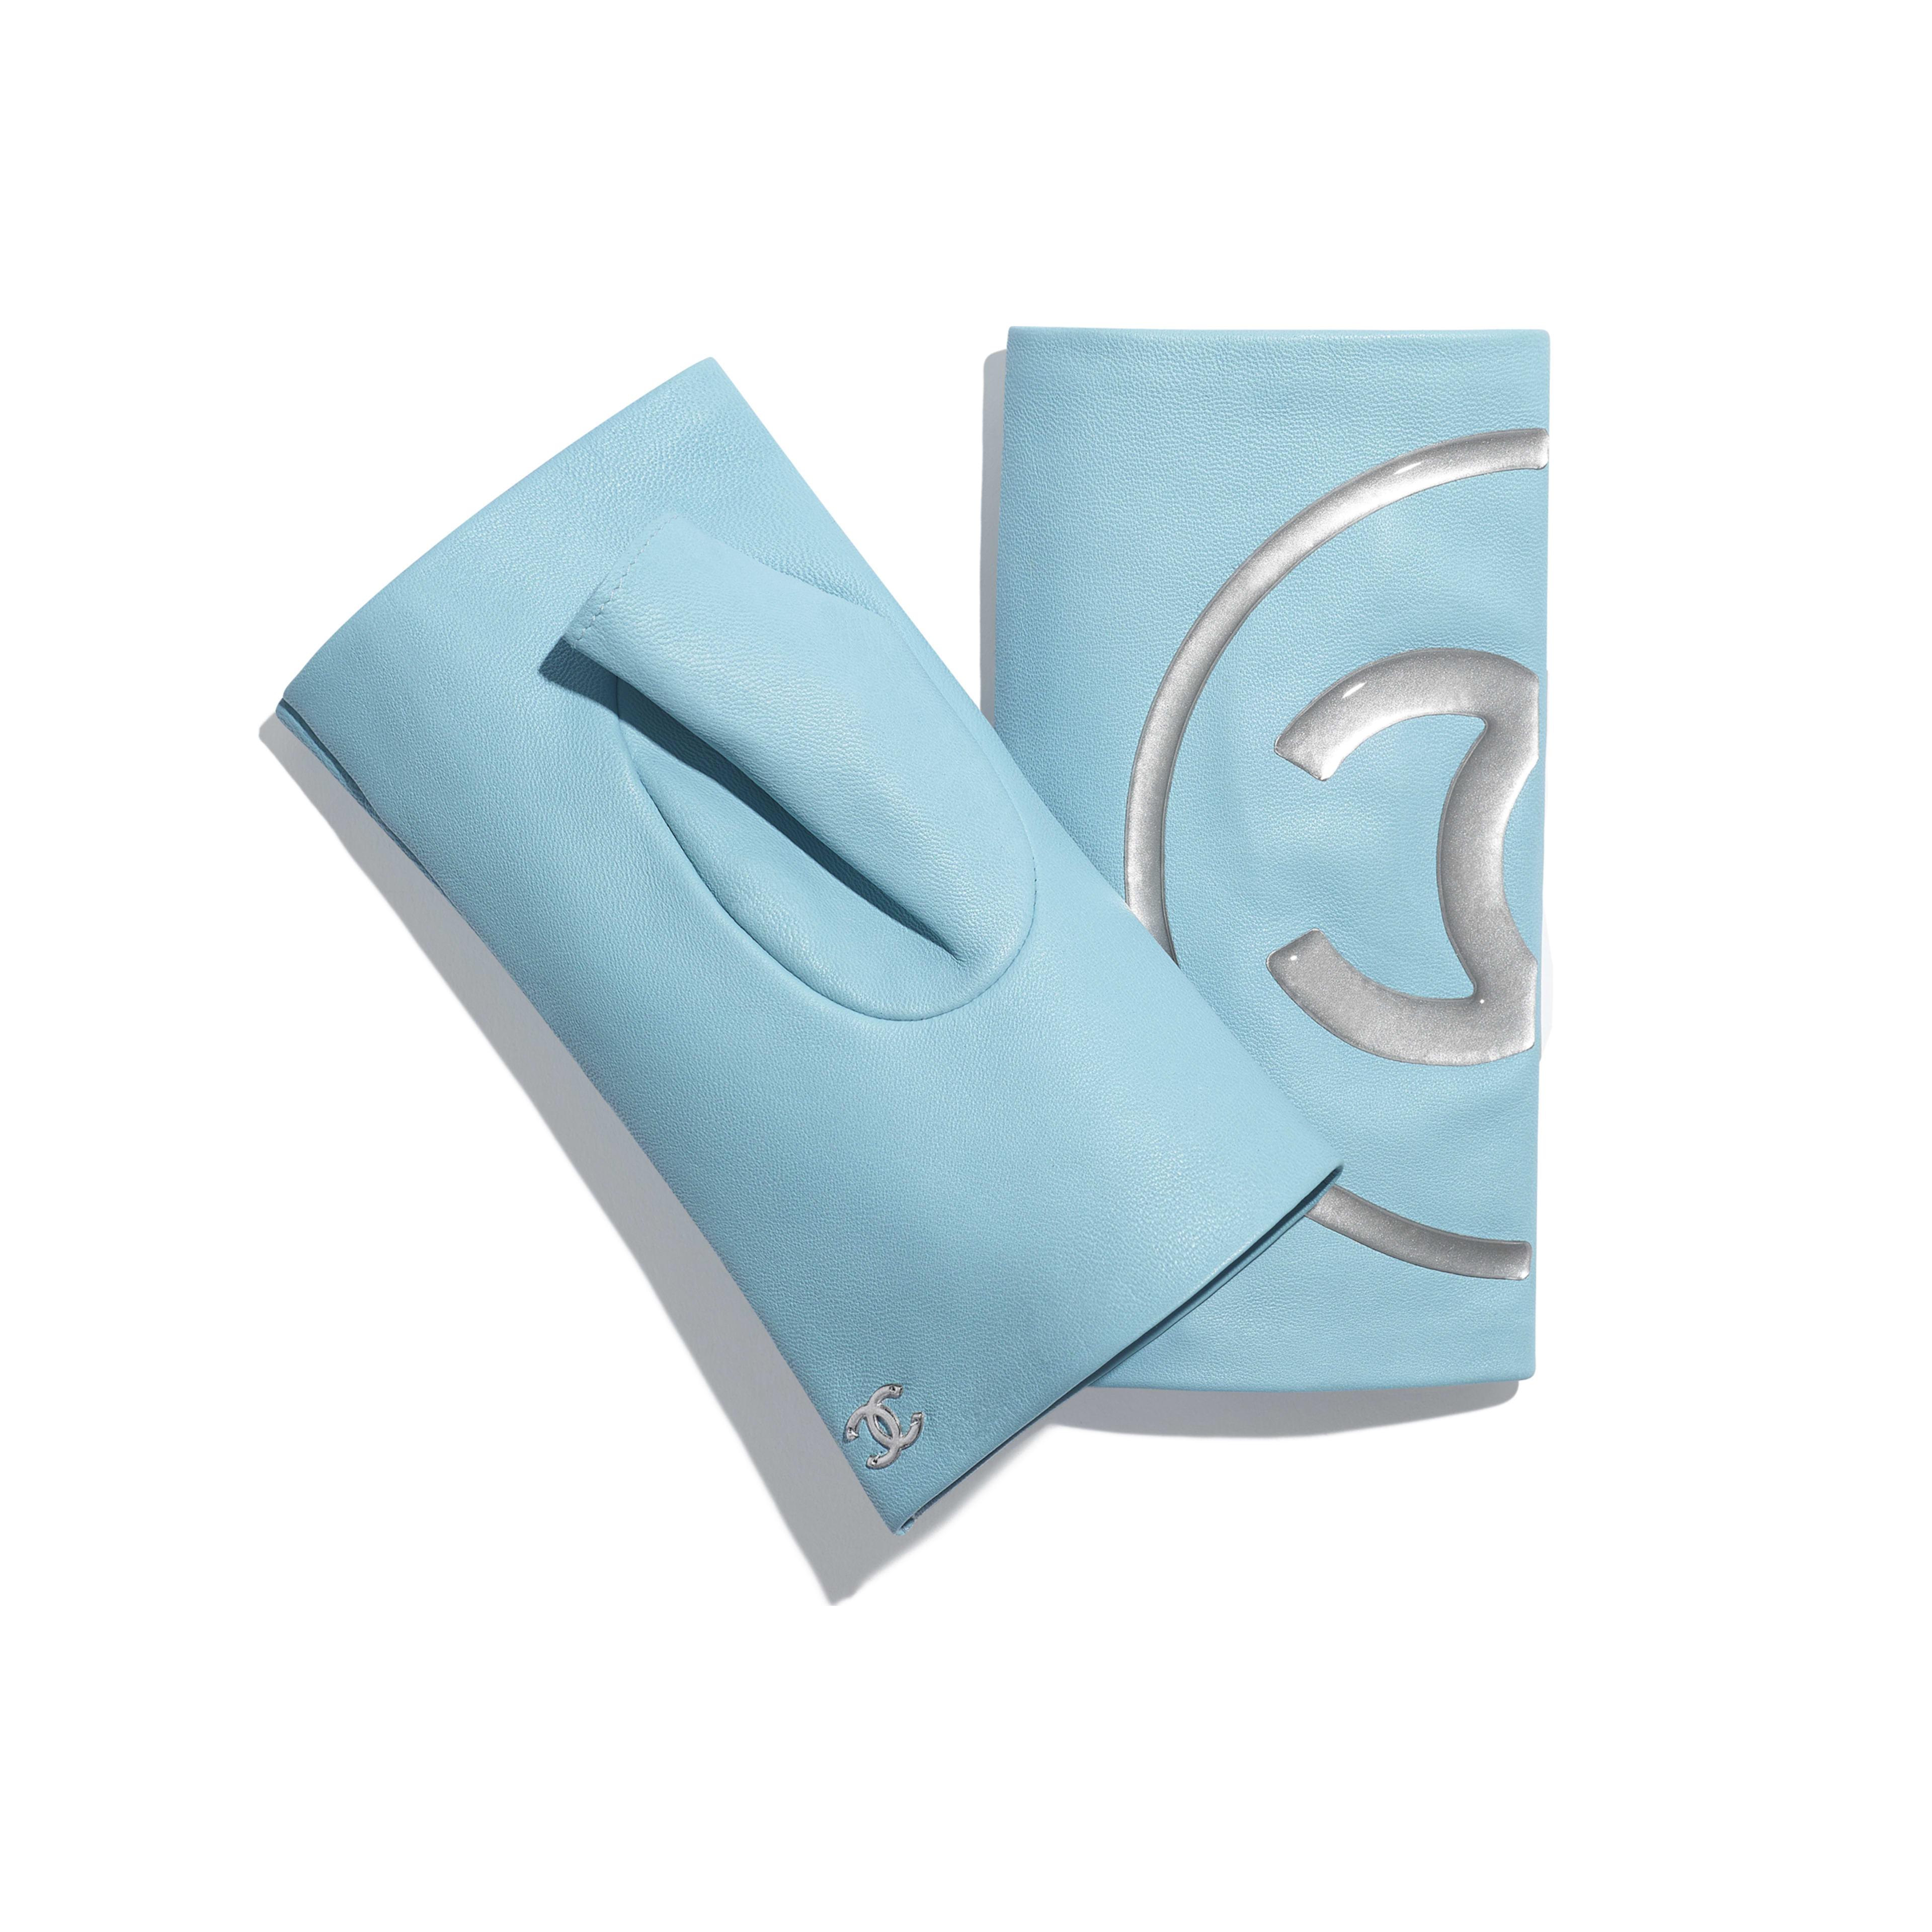 Gloves - Blue & Grey - Lambskin - Alternative view - see full sized version